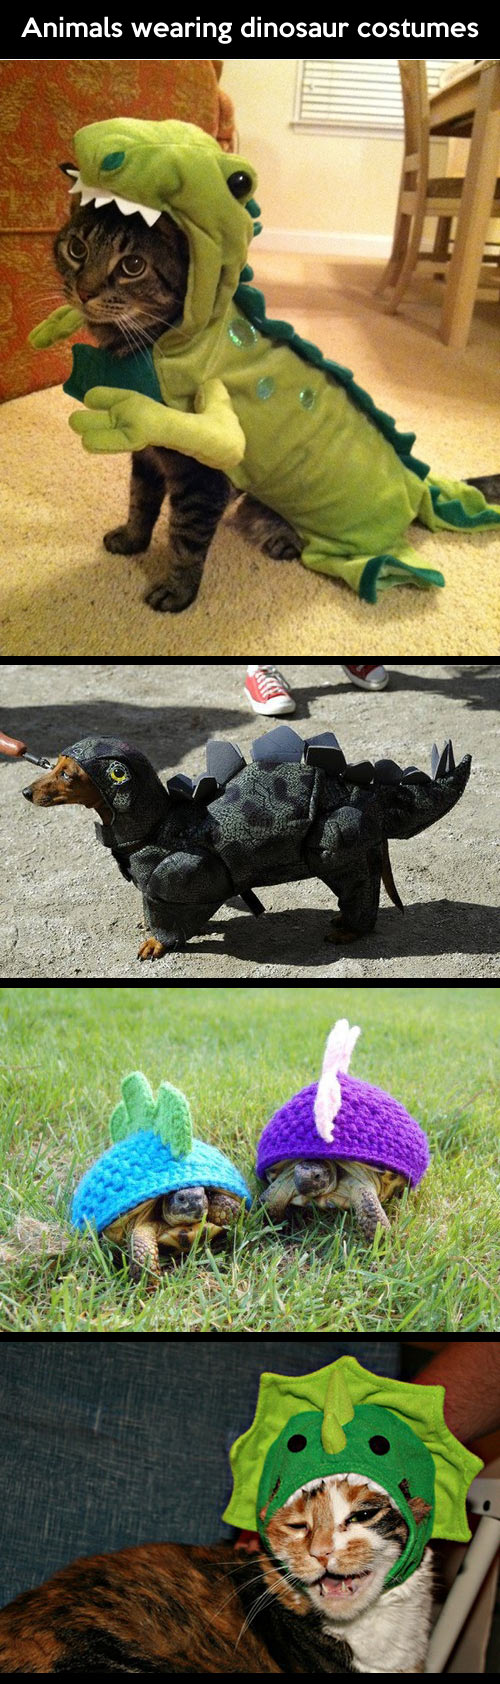 Animals wearing dinosaur costumes...